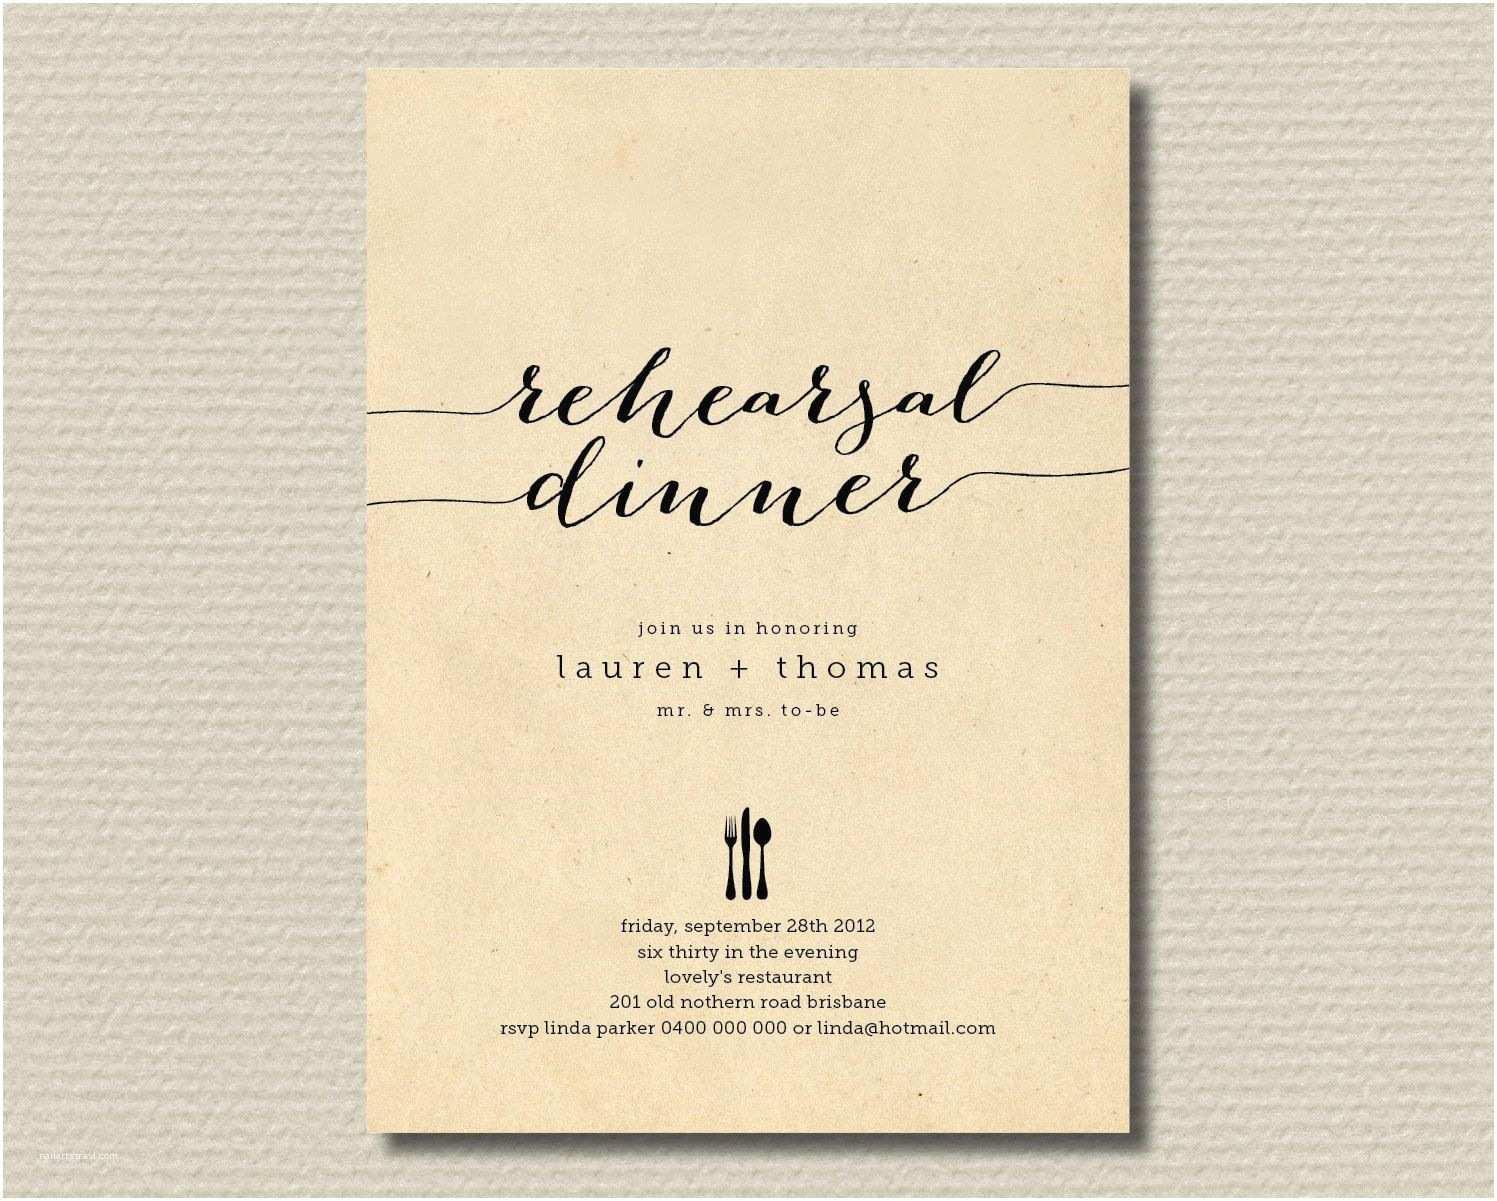 Wedding Rehearsal Invitations Printable Wedding Rehearsal Dinner Invitation Rustic